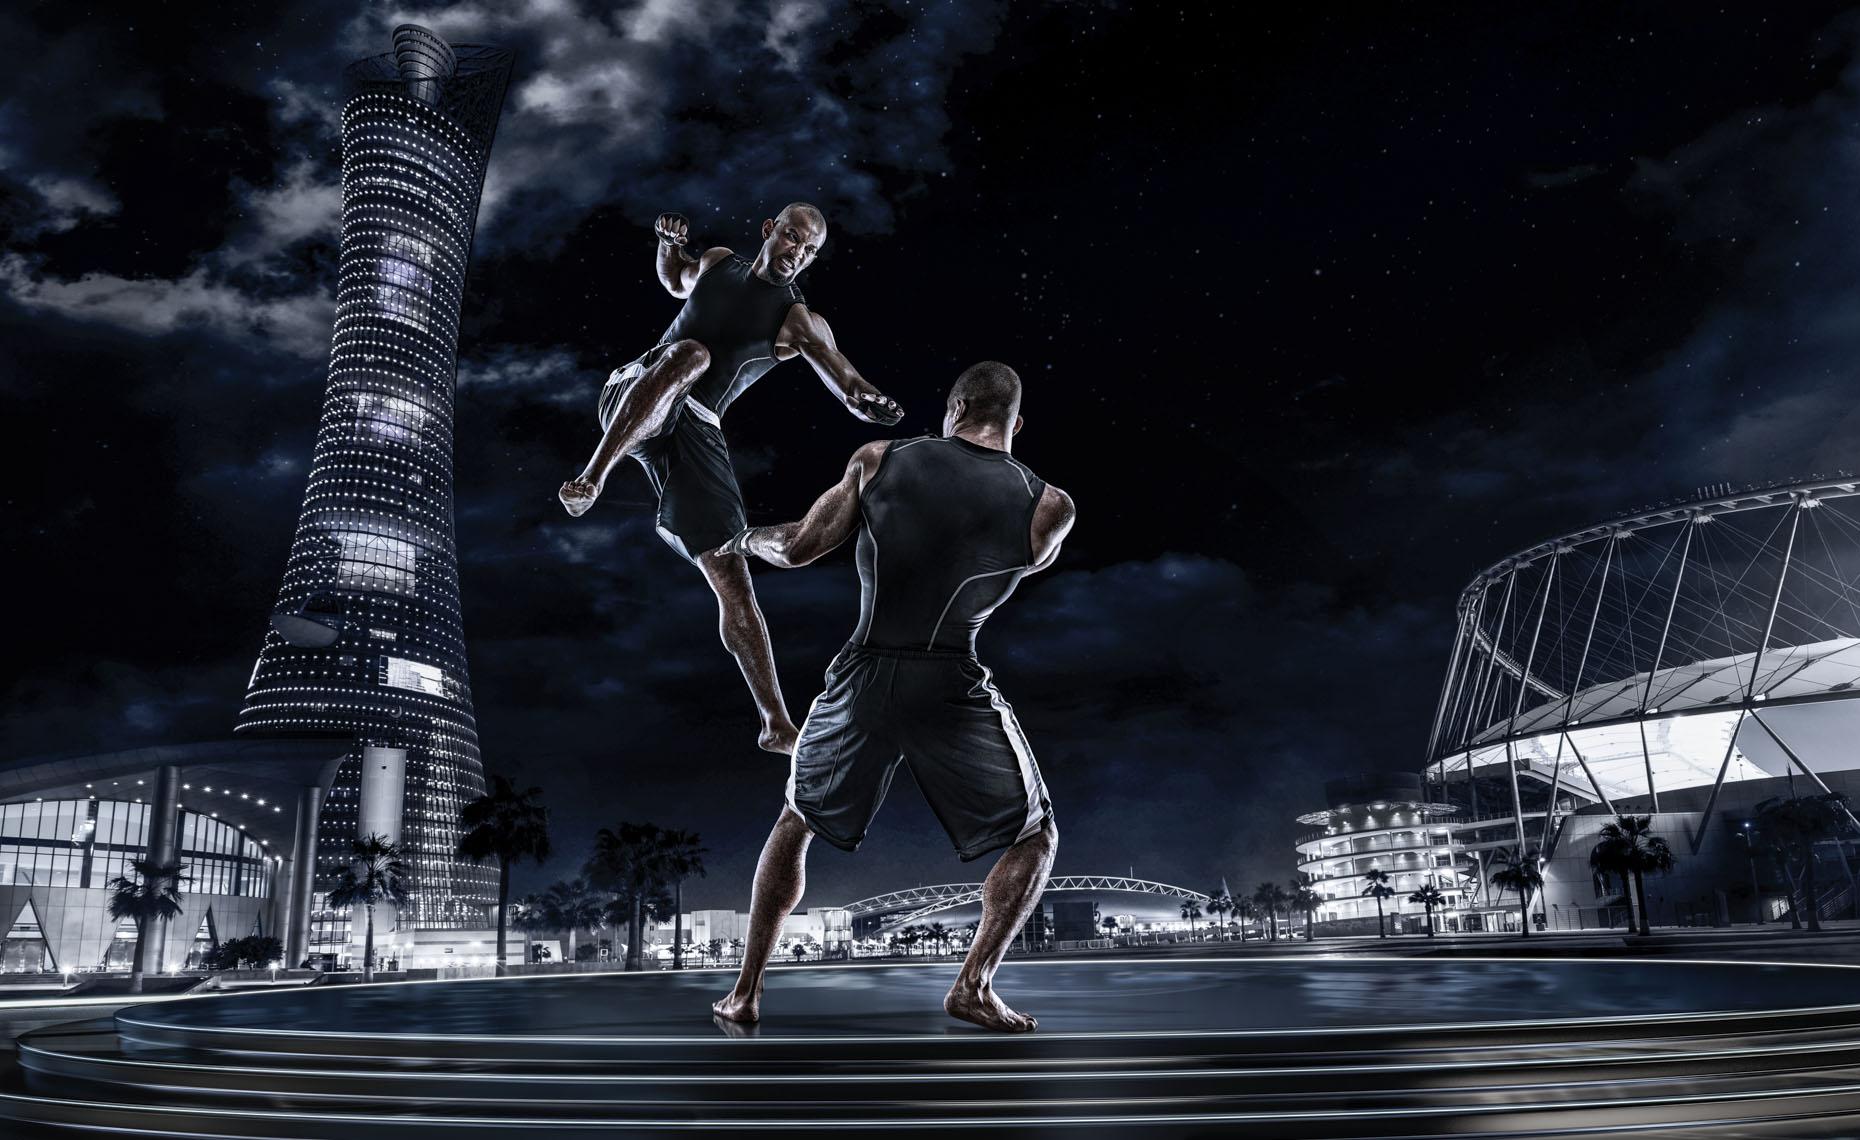 Aspire_MMA_outdoor_FINALv2-DUP (1)